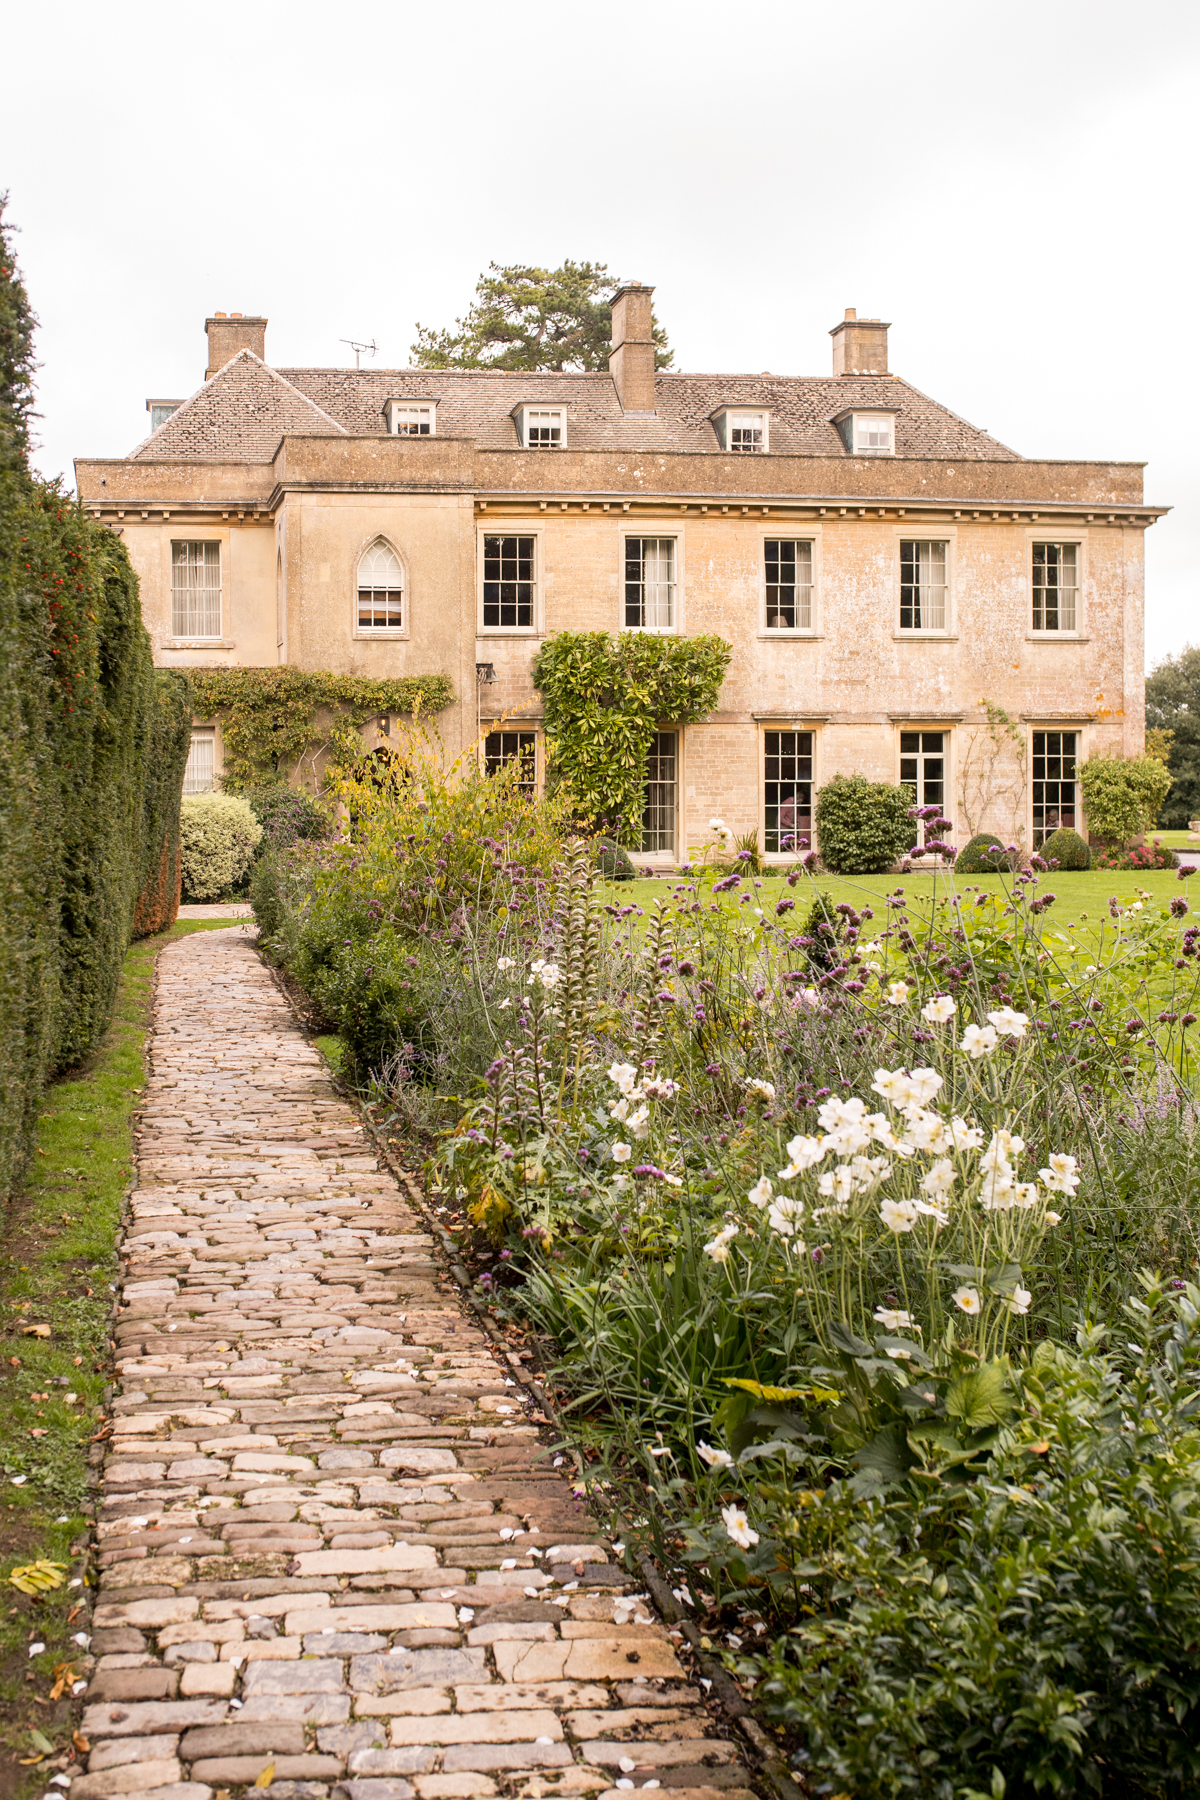 Stacie Flinner Soho House Babington House England-89.jpg